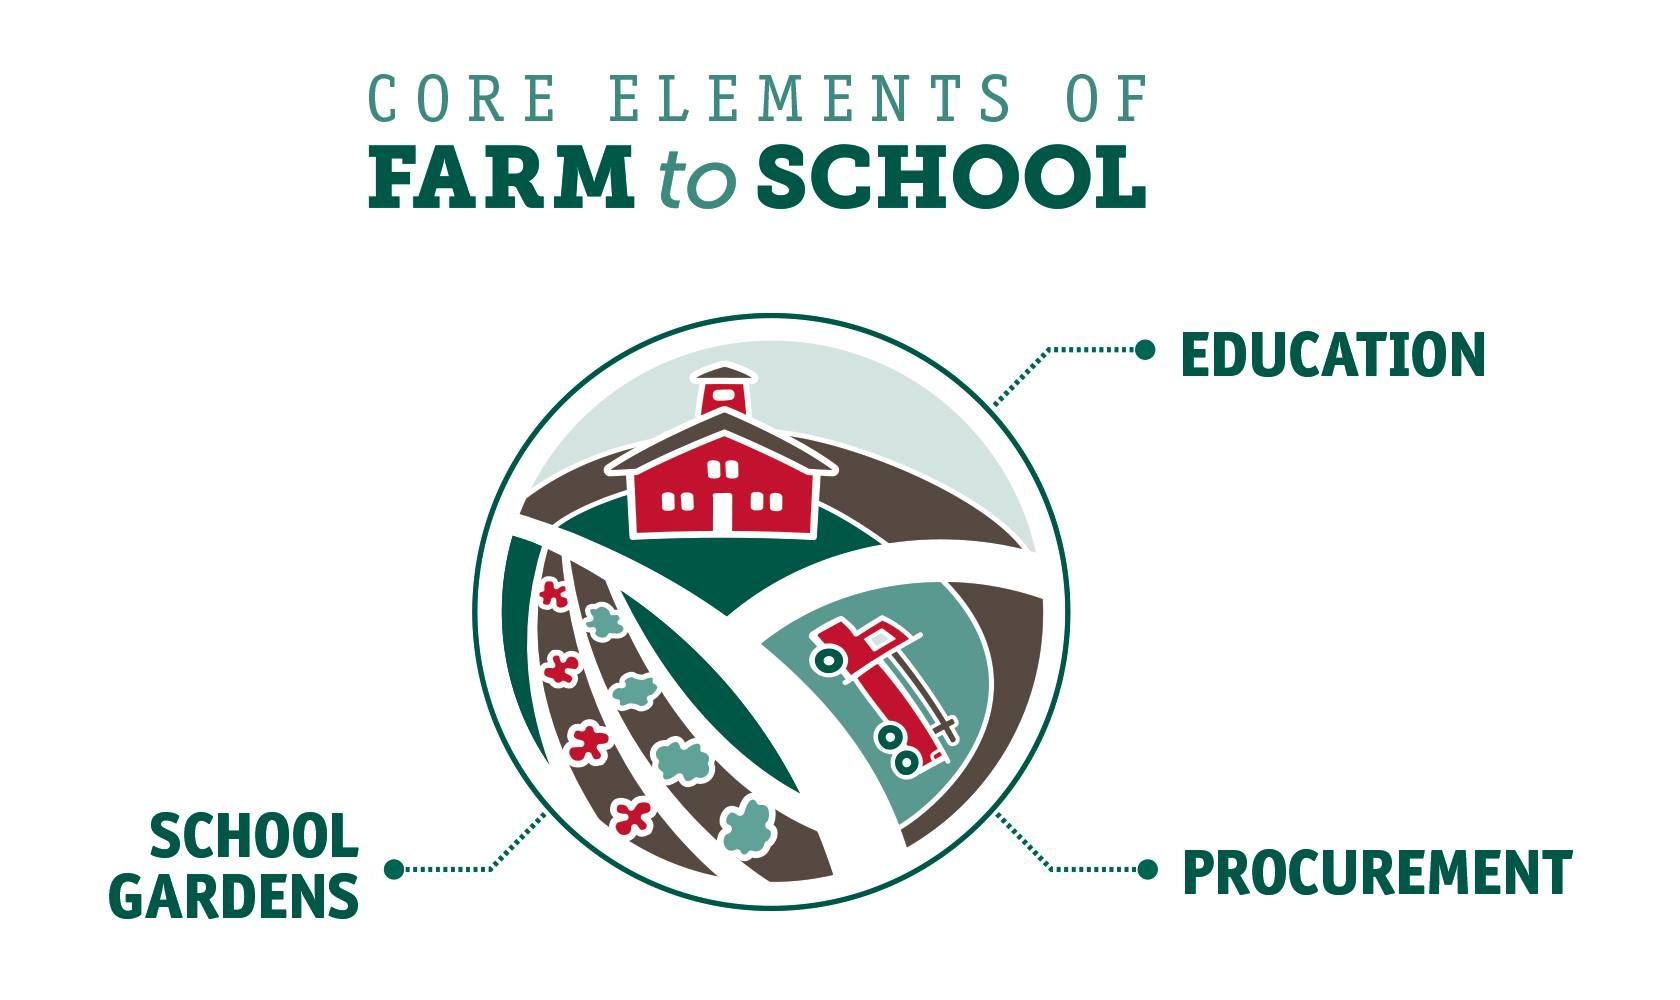 Farm to School Program Model. Credit: National Farm to School Network